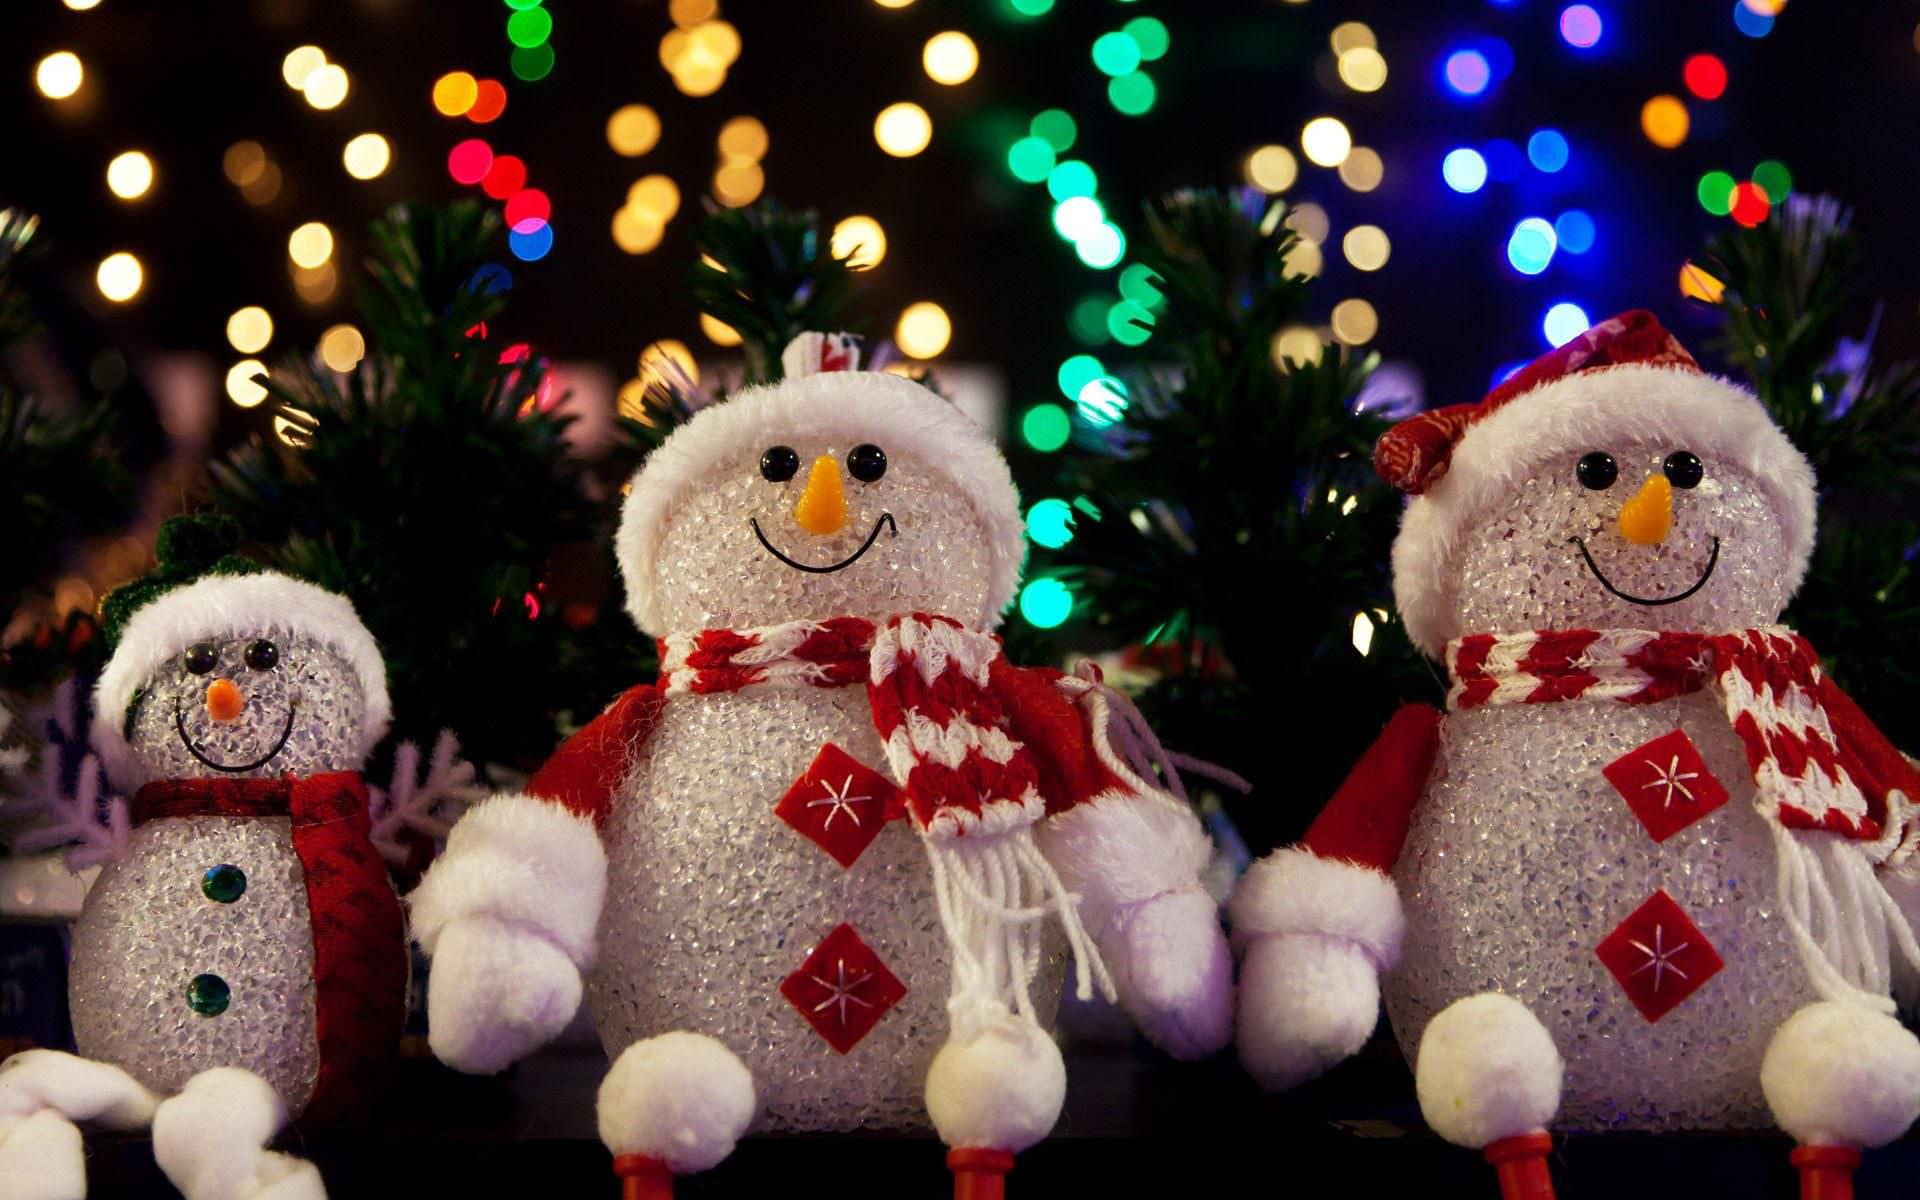 christmas-snowman-decorations-holiday-hd-wallpaper-1920x1200-20527